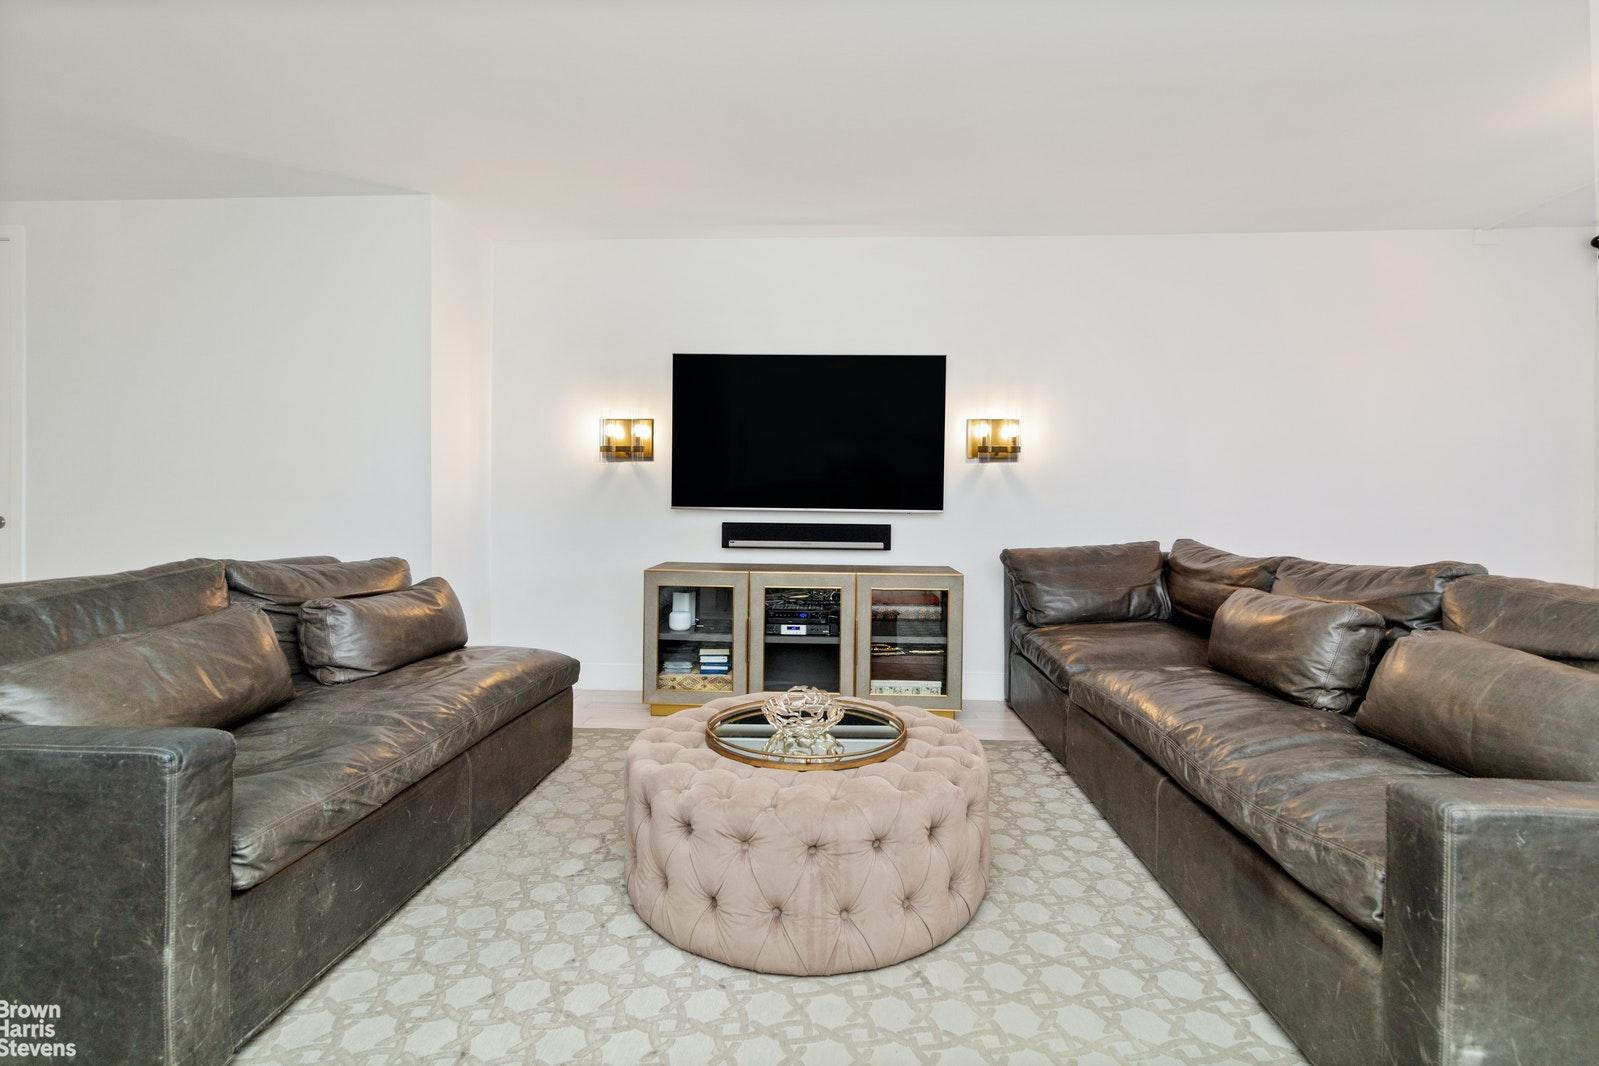 Apartment for sale at 1175 York Avenue, Apt 4E